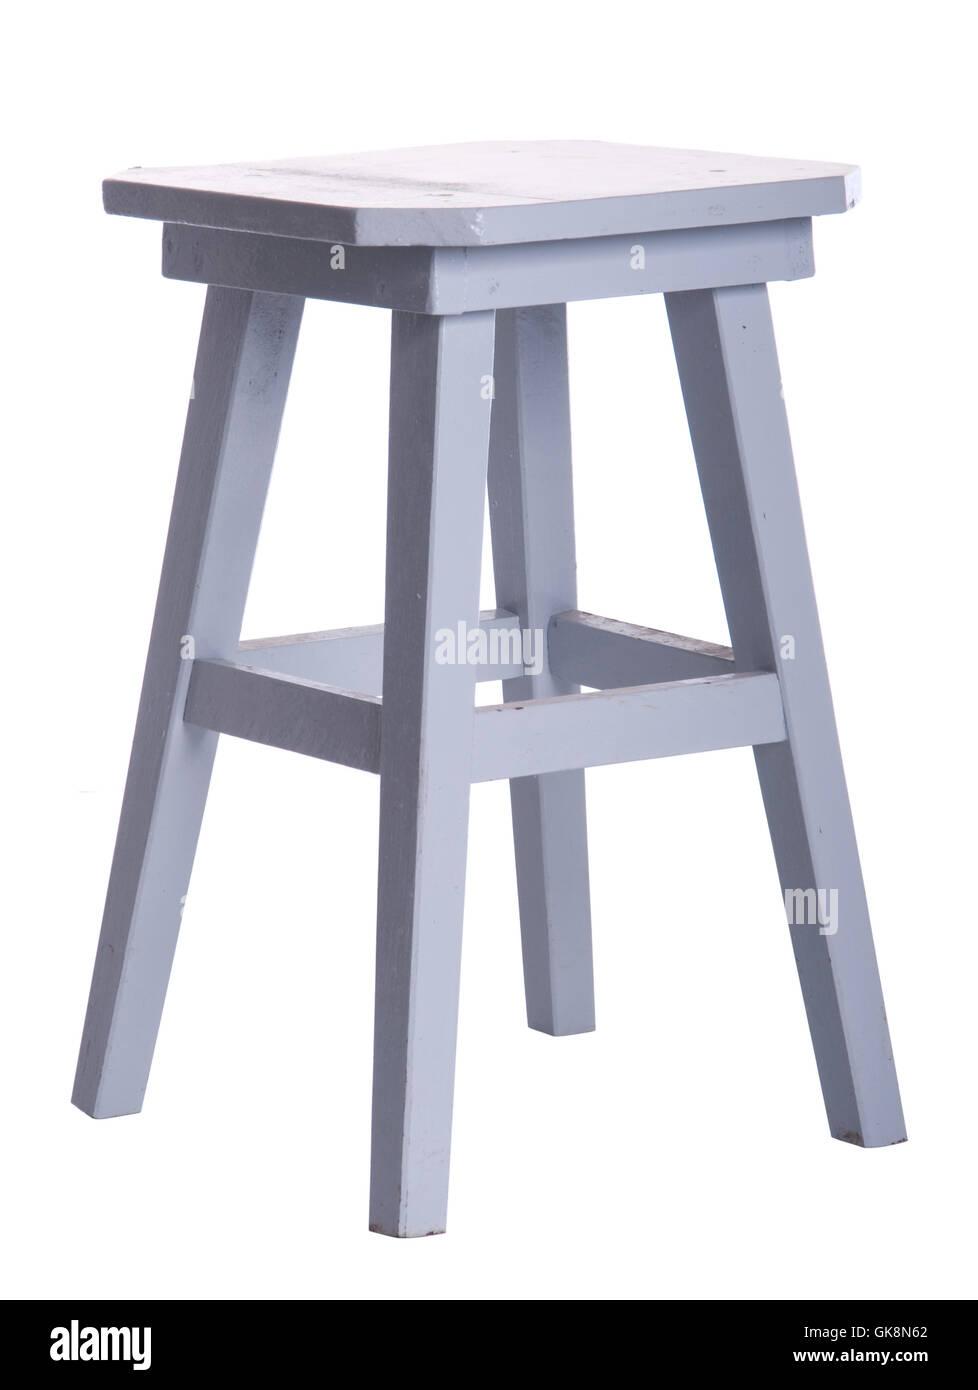 stool isolated furniture - Stock Image